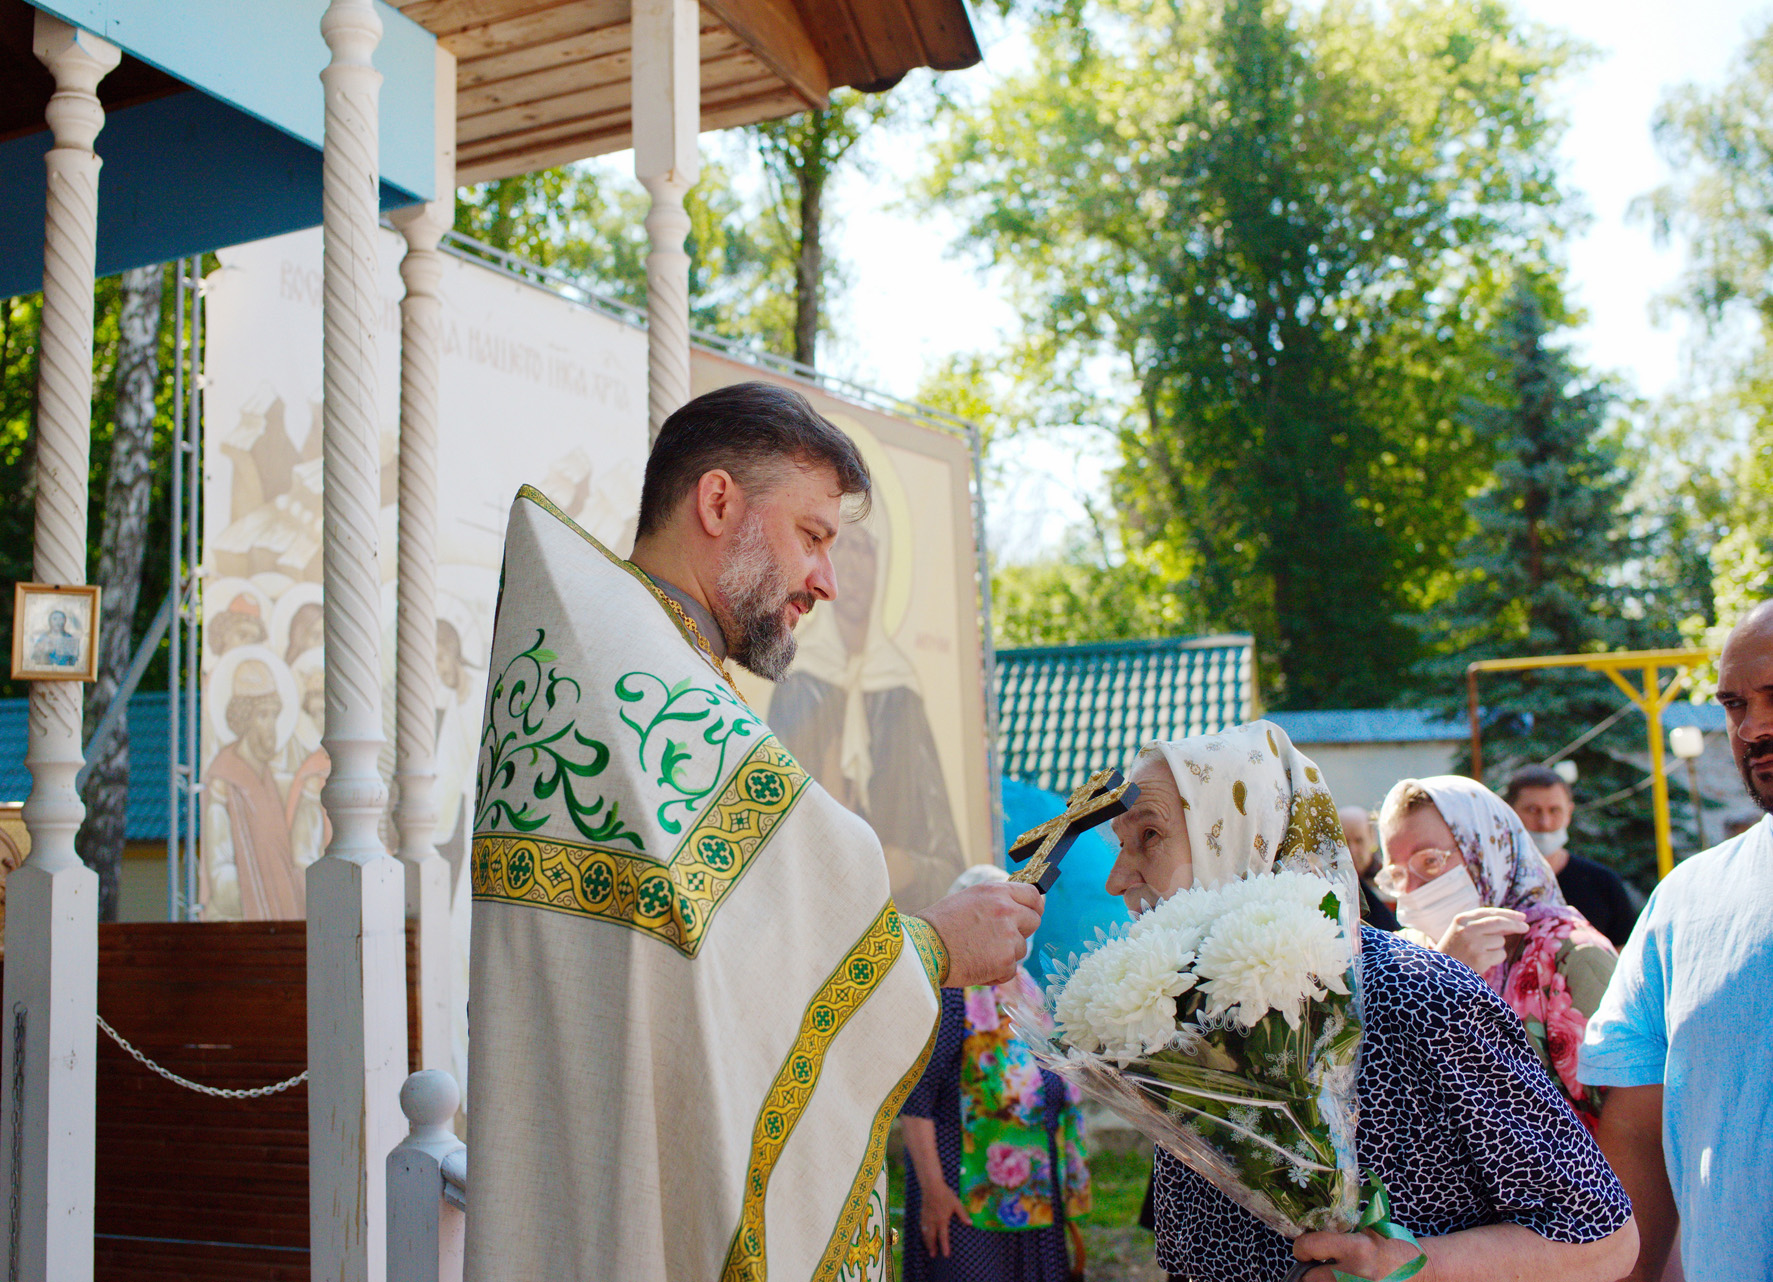 http://monuspen.ru/photoreports/63cee2eedb0b6f9799f6ffc103c27fao.jpg